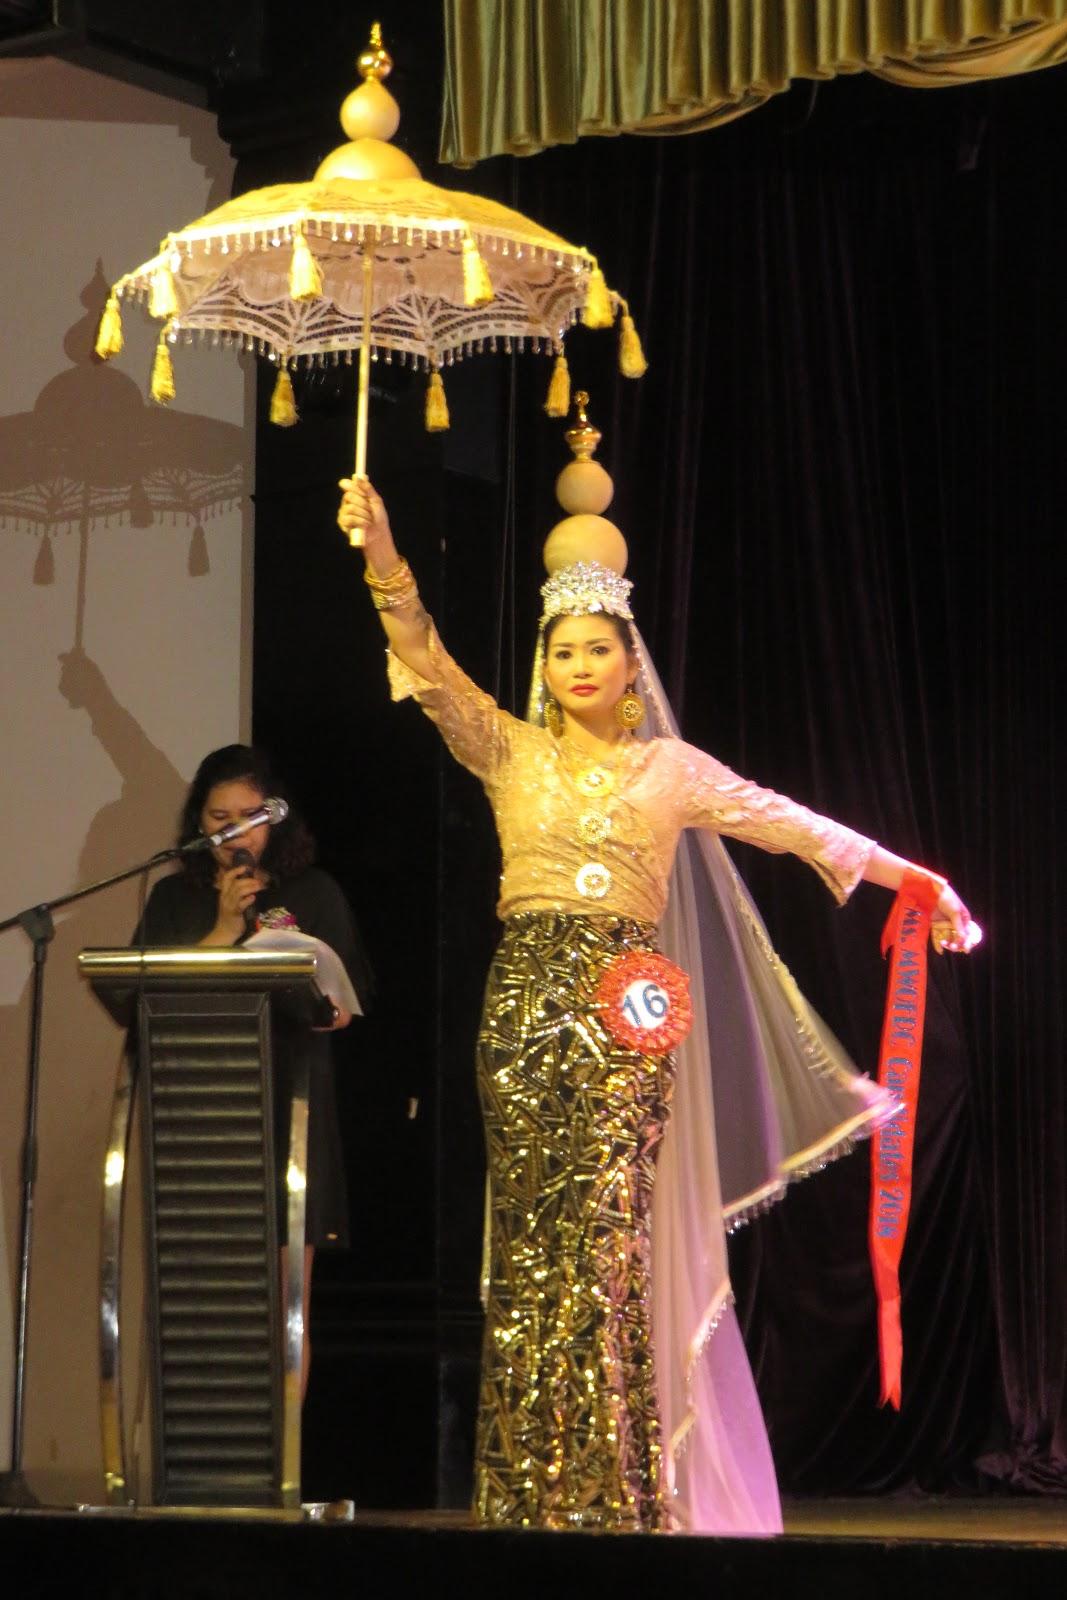 Kee Hua Chee Live!: PART 2---CORONATION OF MISS MWOFRC 2018